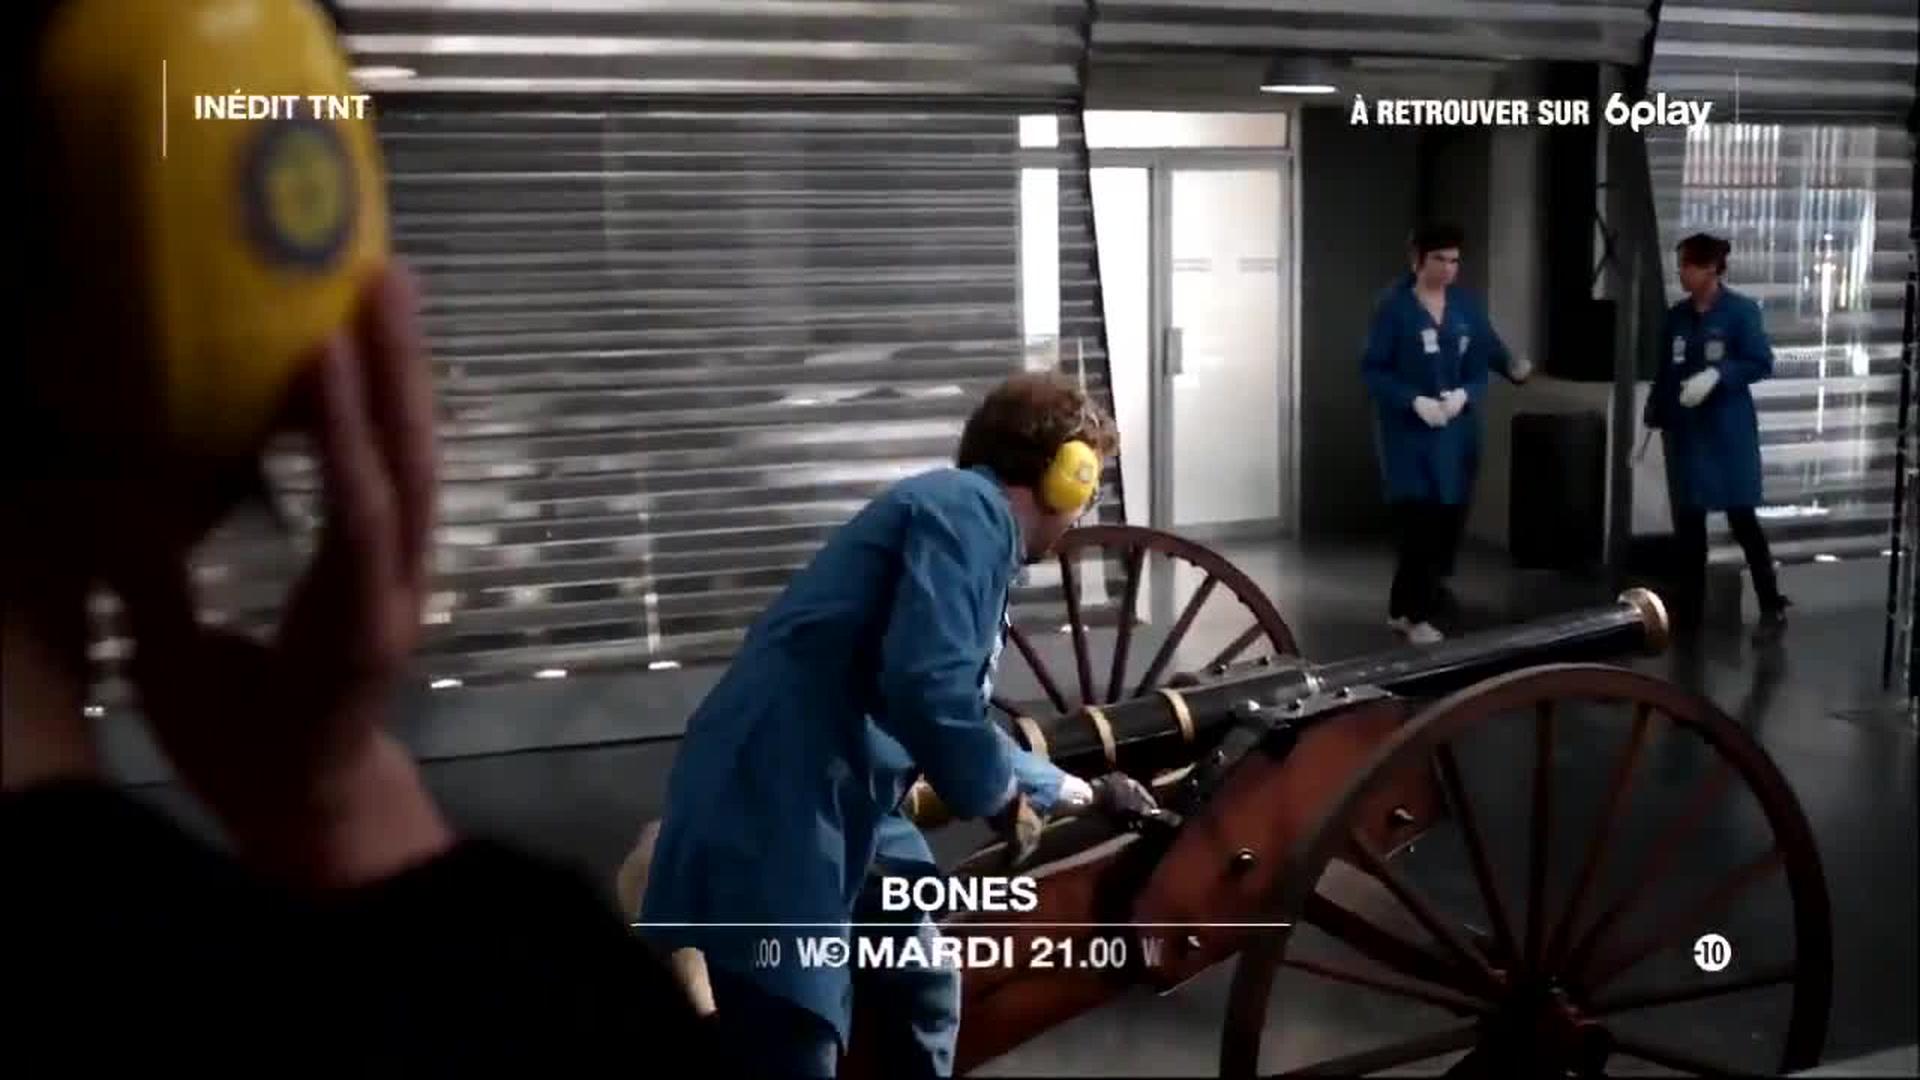 Bones : La fin du monde